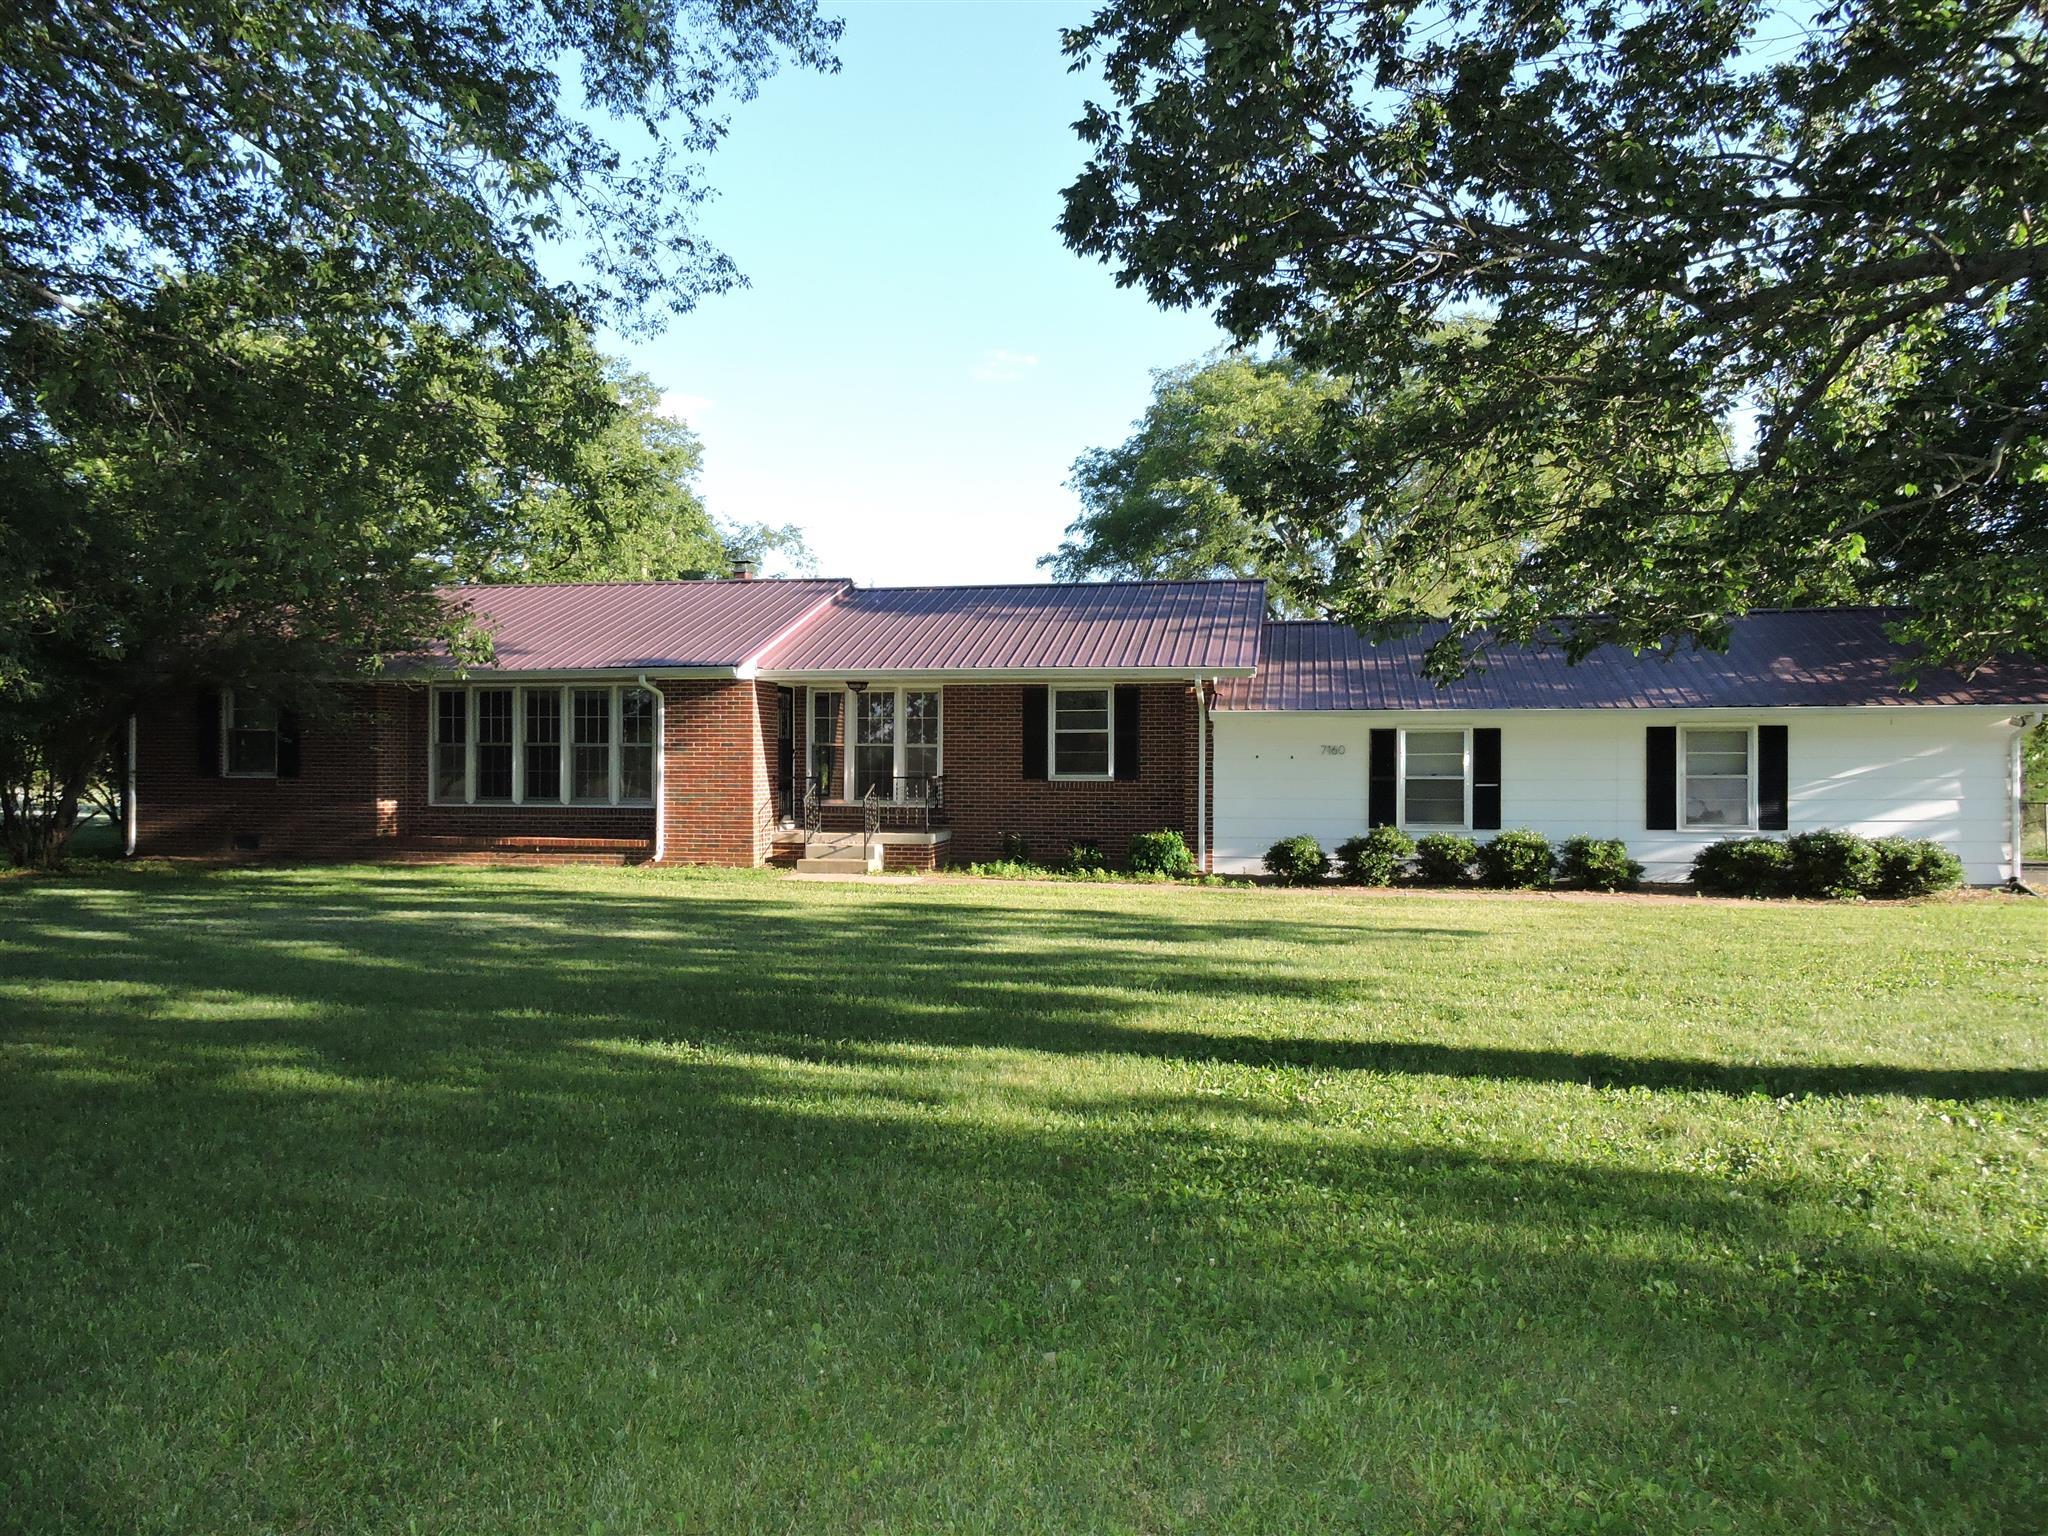 7160 Miller Johnson Rd, Christiana, TN 37037 - Christiana, TN real estate listing